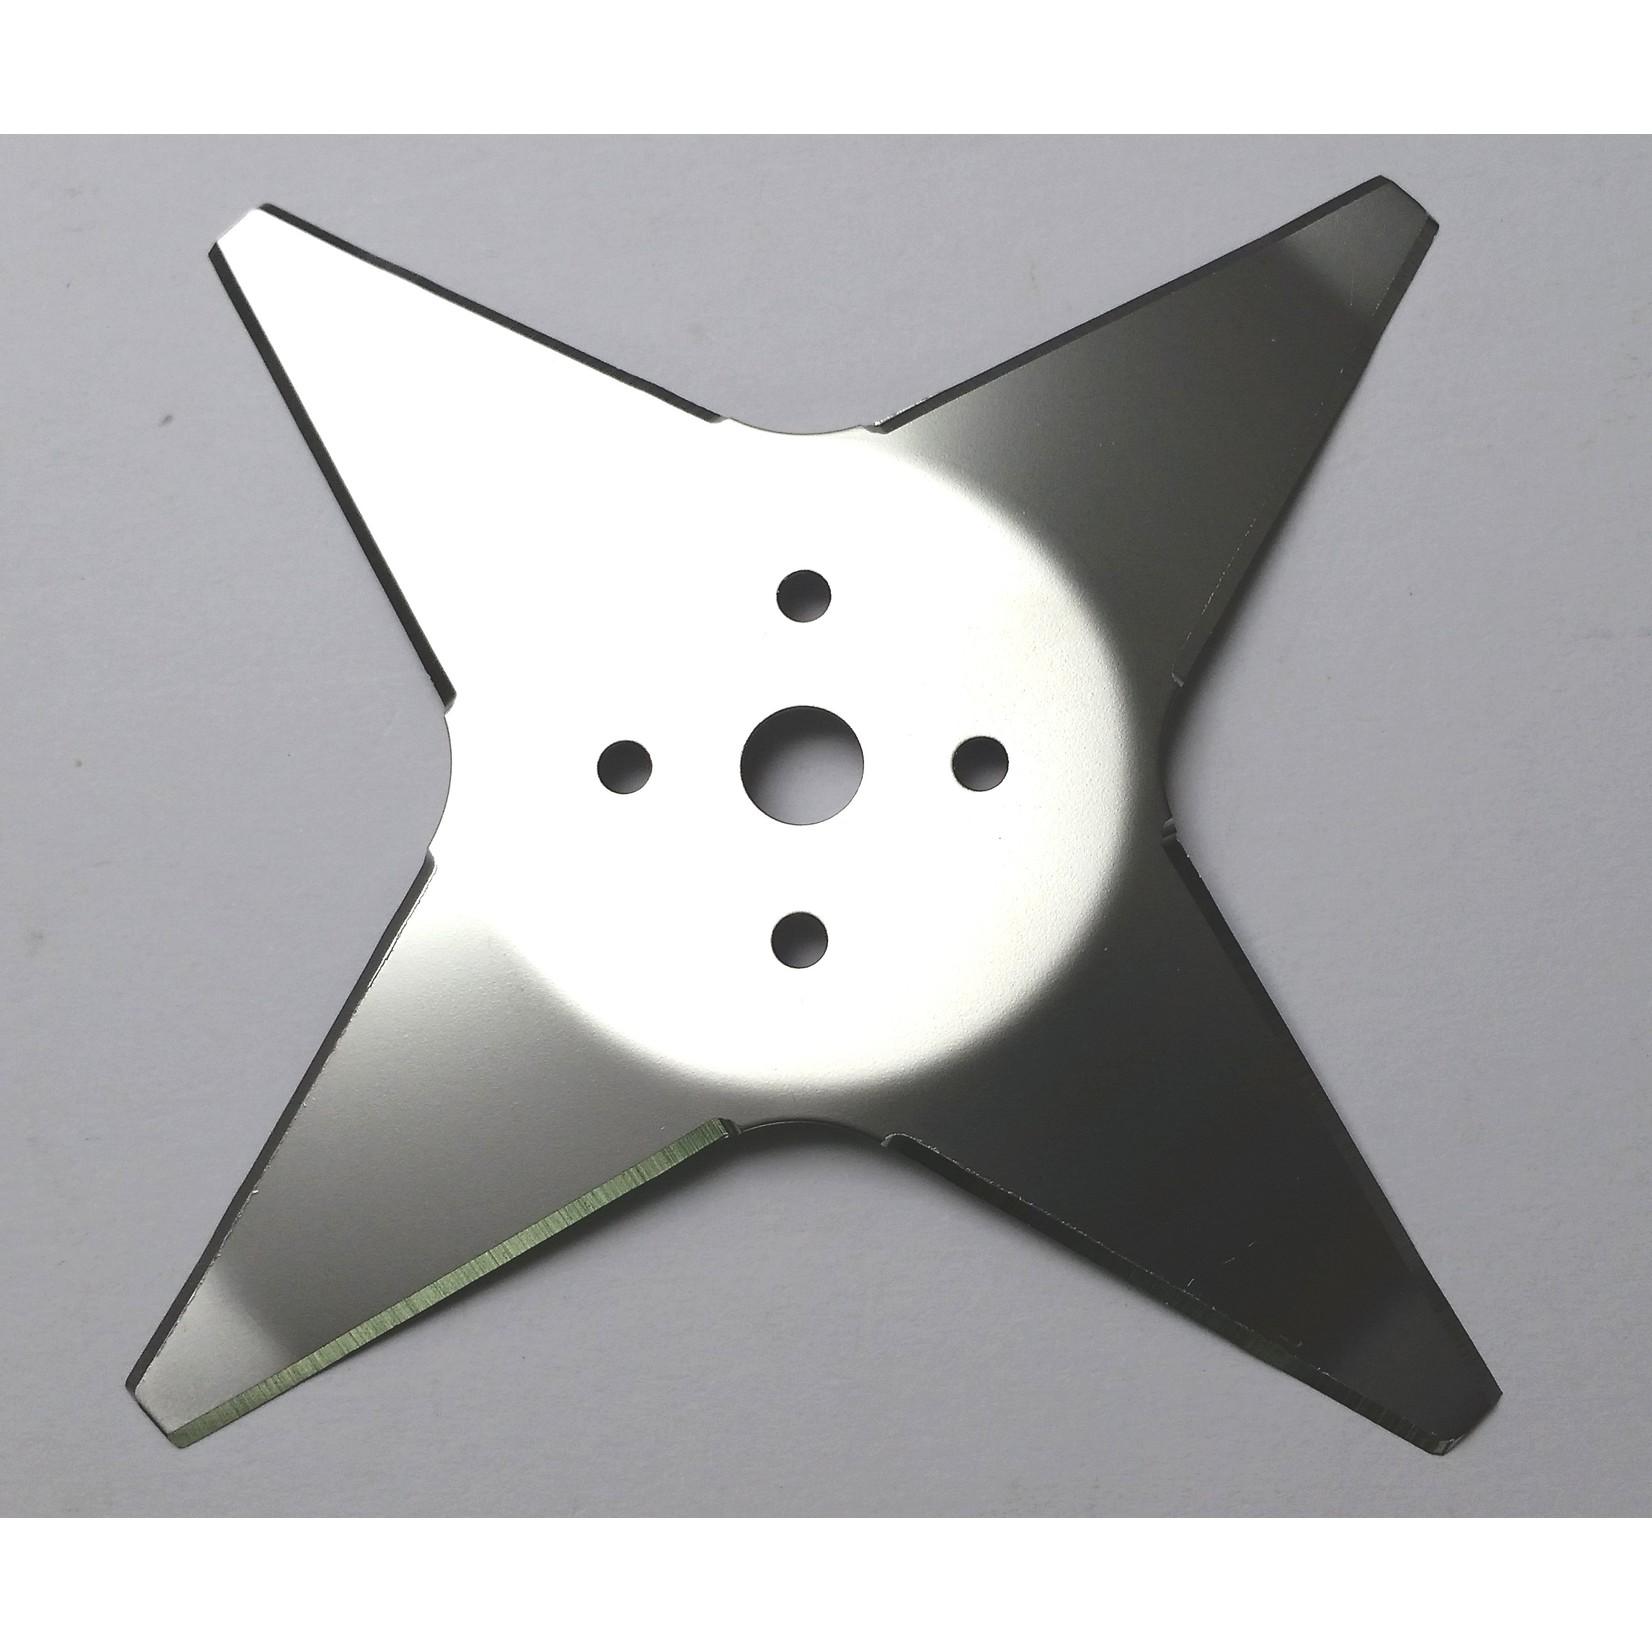 Ambrogio Ambrogio 015Z03700A 4-Stern Federstahlmesser Original 15 cm  für Ambrogio L15   989095